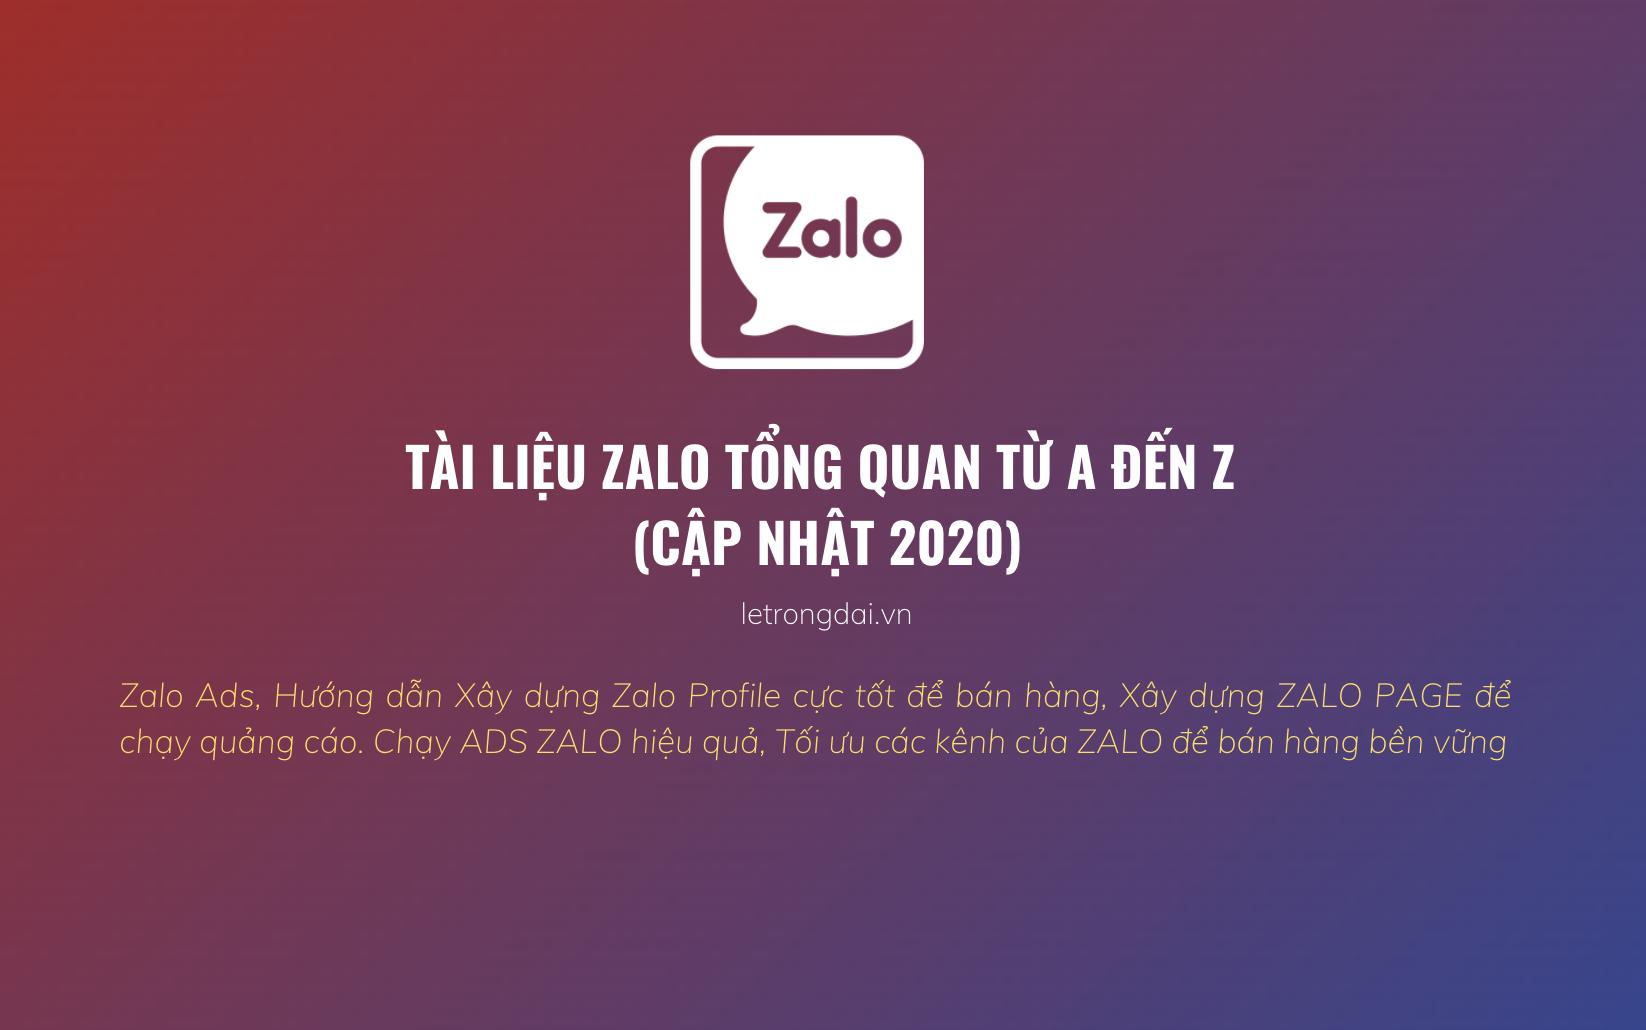 Tài Liệu Zalo Tổng Quan Từ A đến Z (update 2020